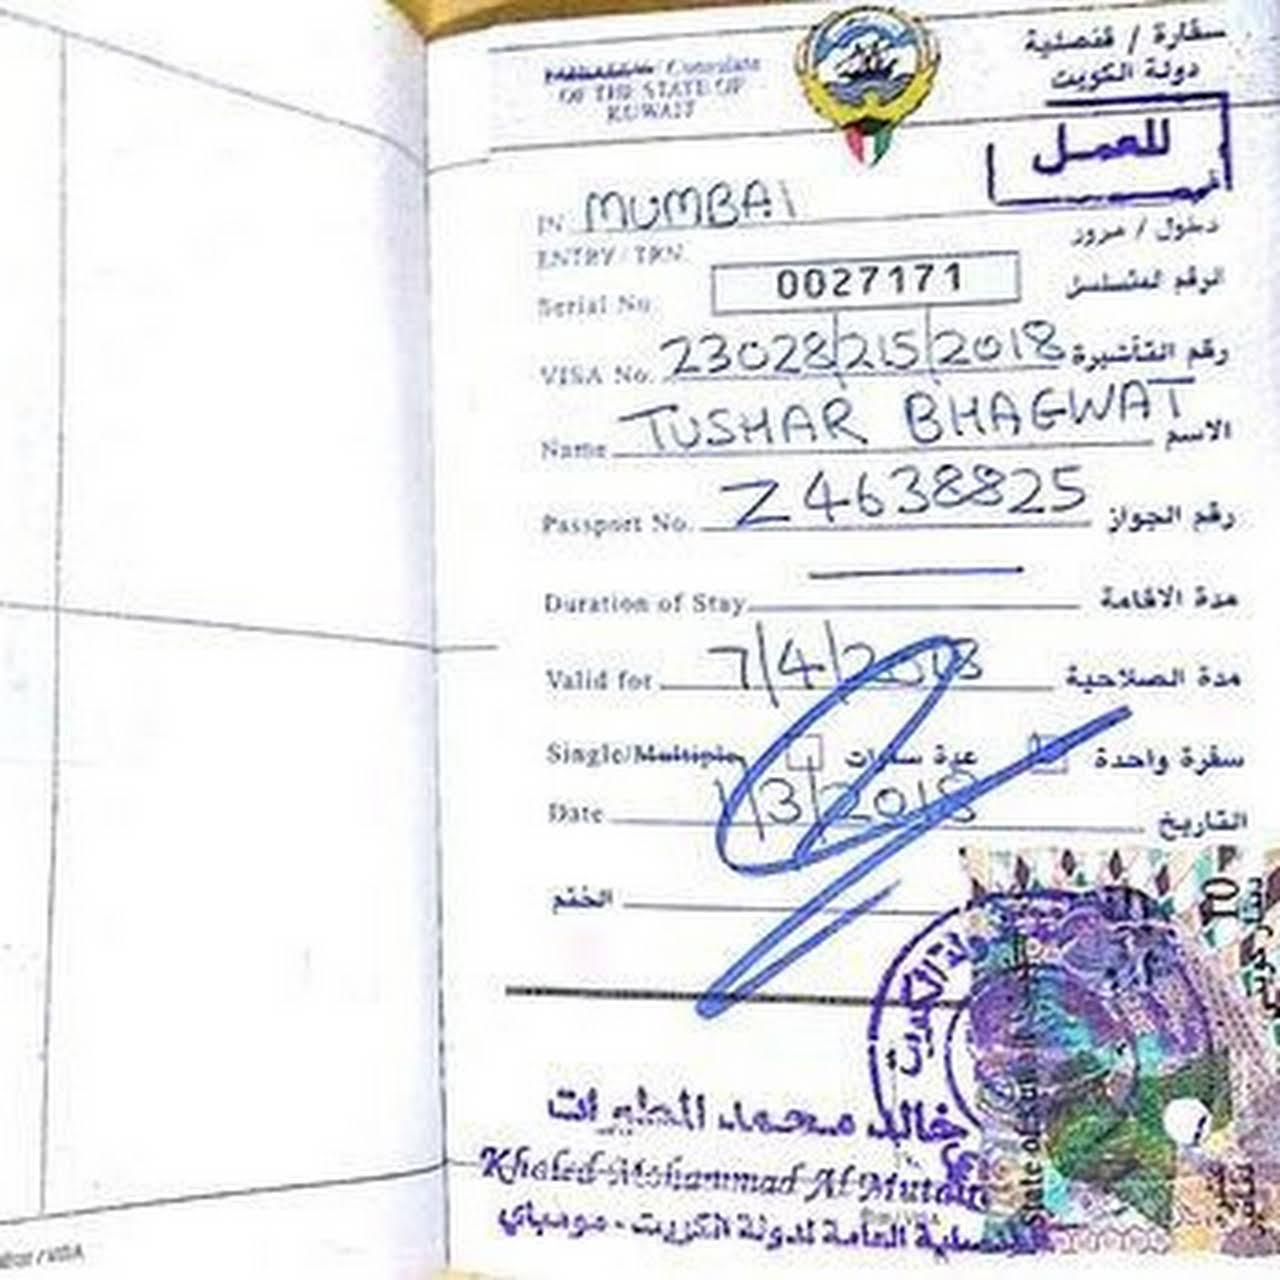 TCT INTERNATIONAL - Work Permit & Work Visa Provider for